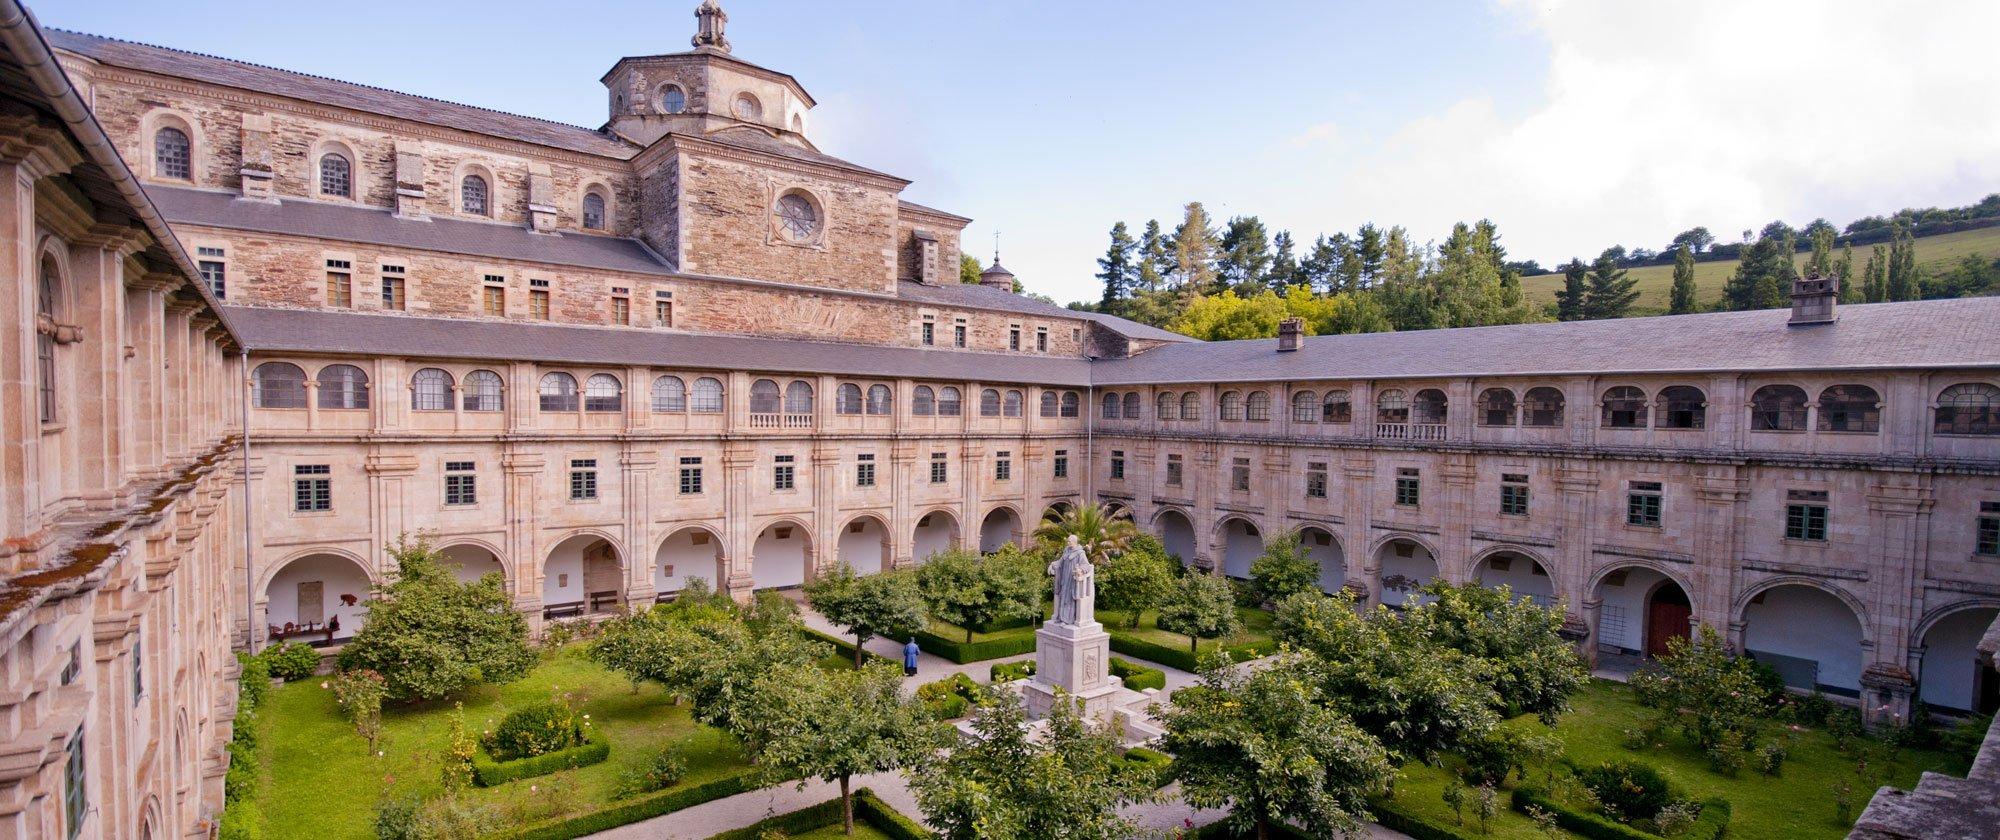 Claustro monasterio de samos